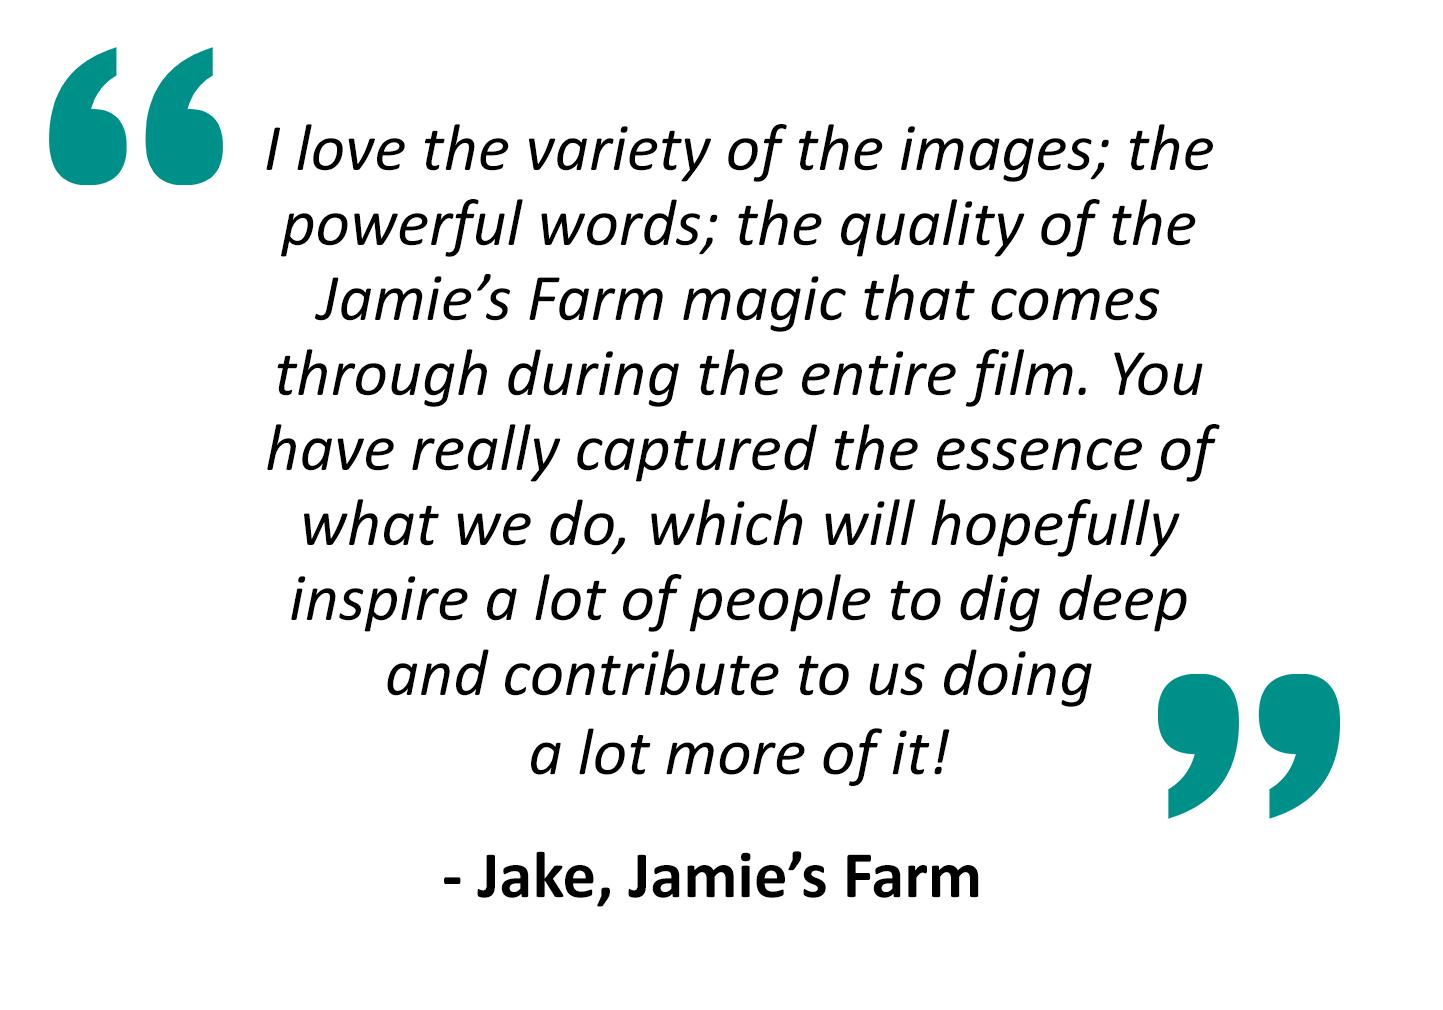 Jamie's Farm quote.png